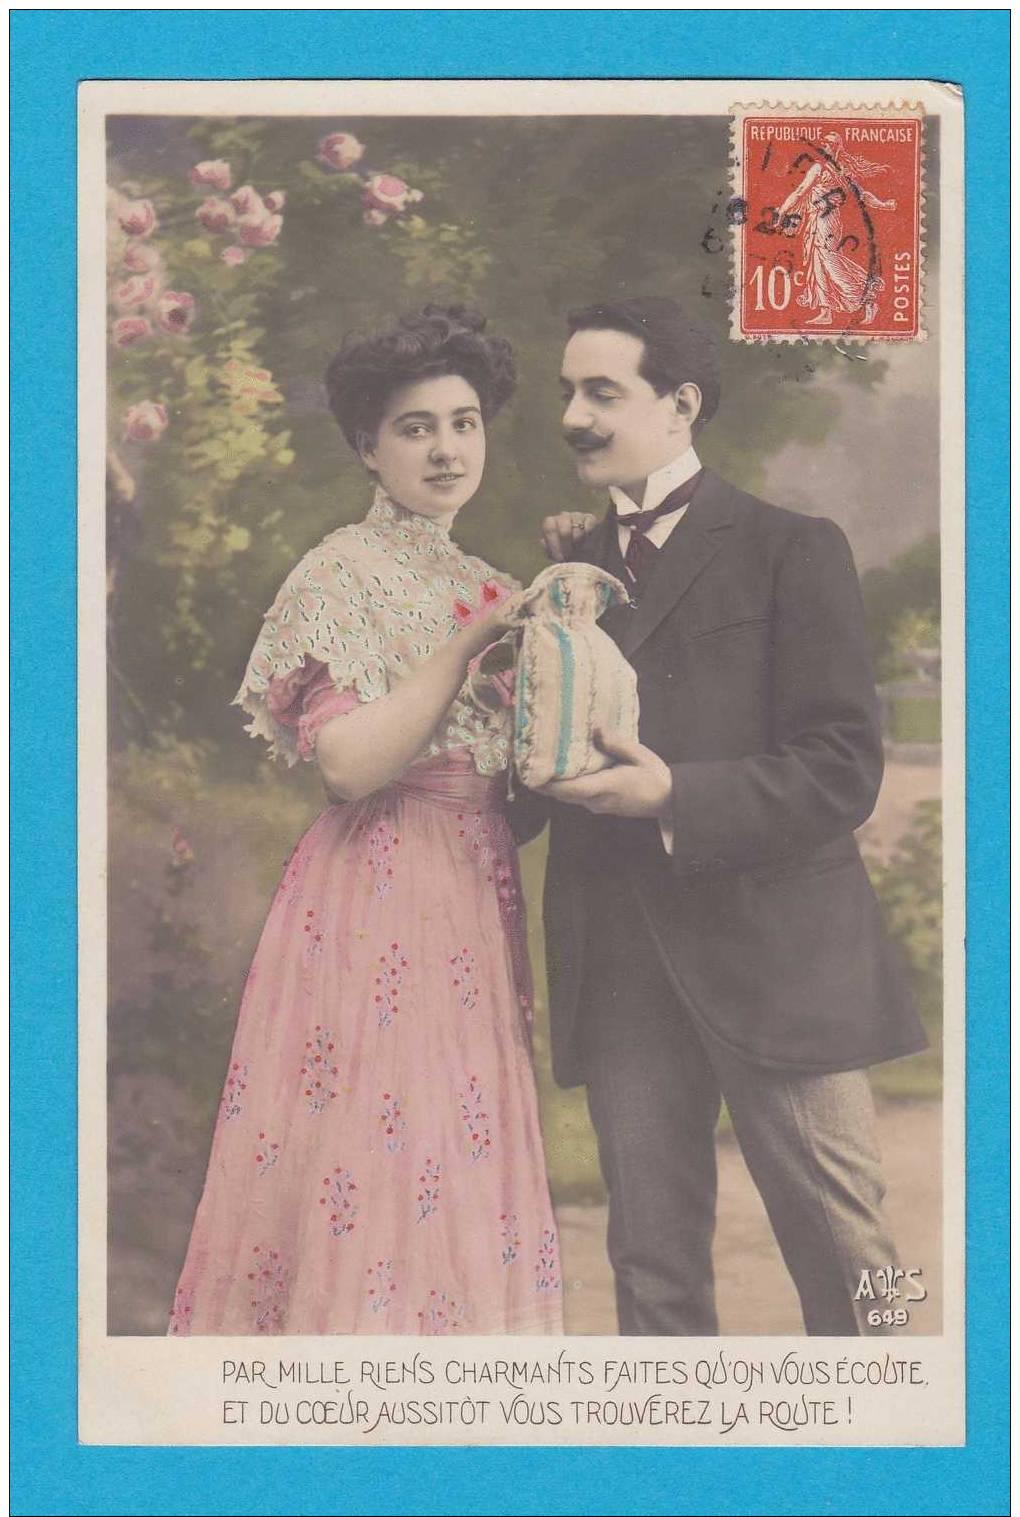 Pâques   Couple  Avec Oeuf     EDT  As 649 - Ostern